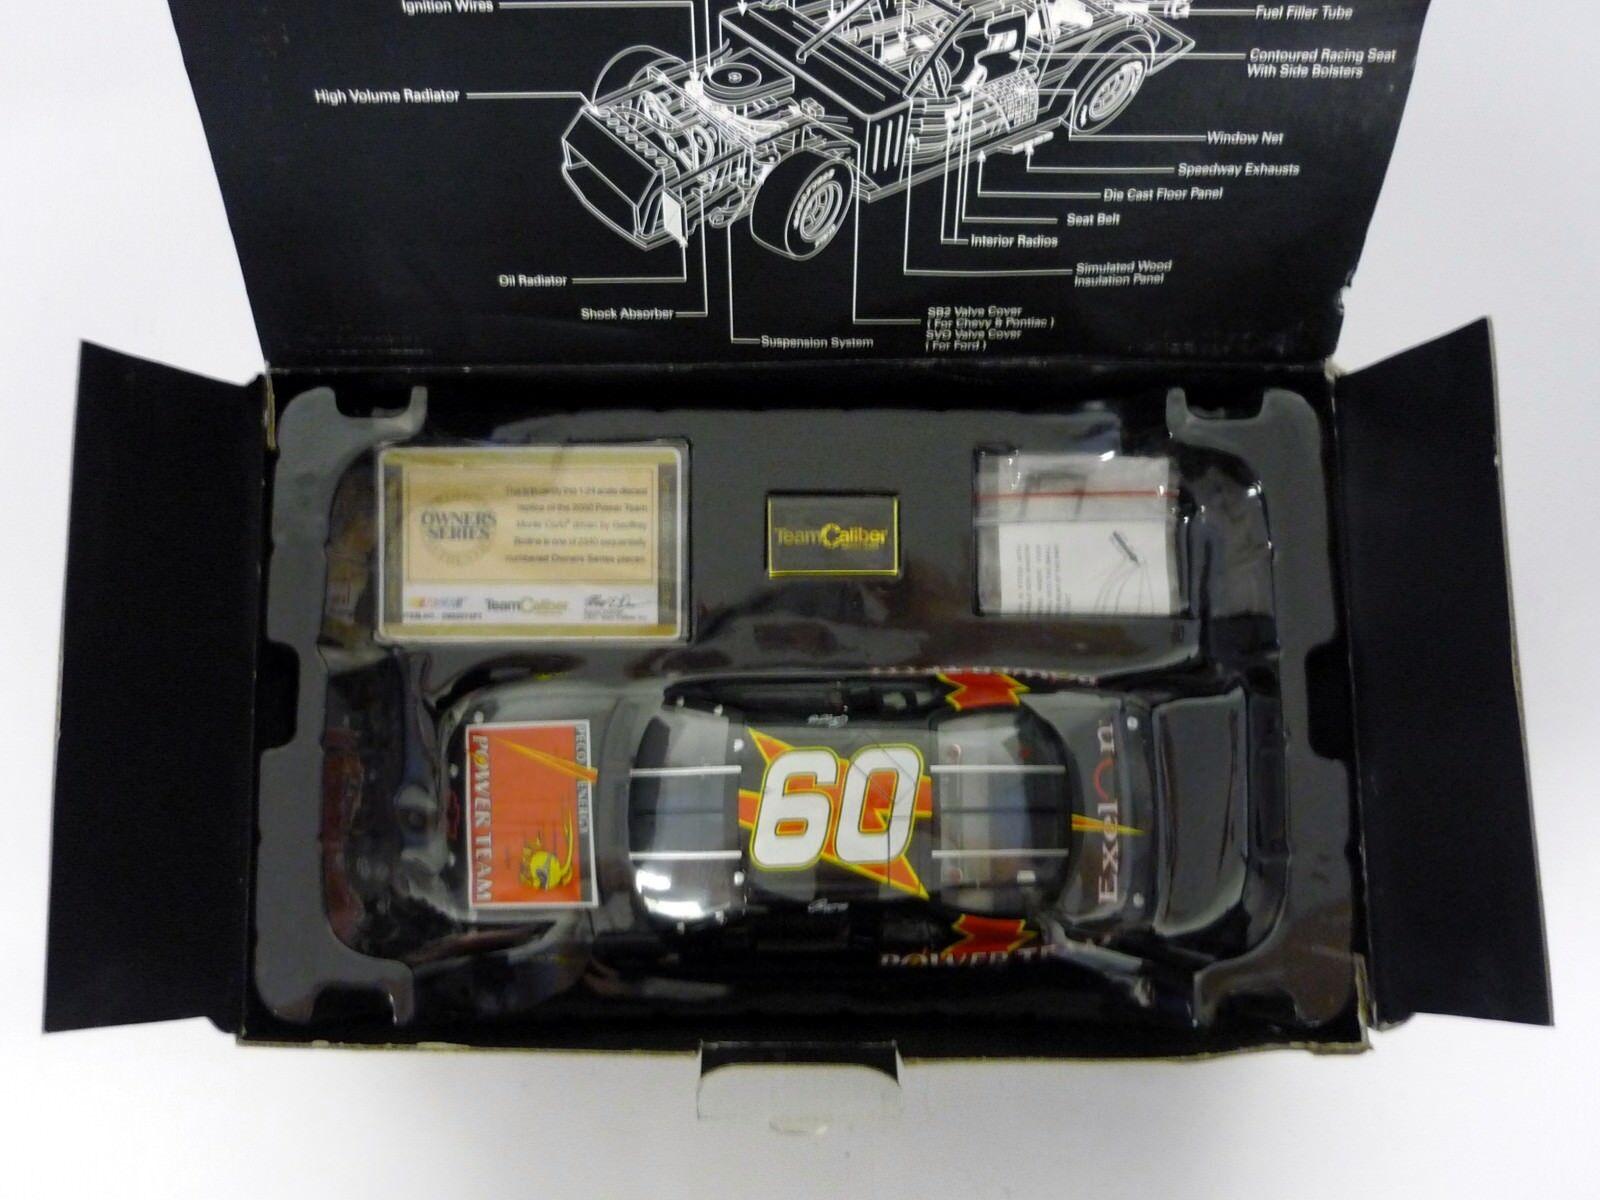 TEAM CALIBER NASCAR Peco Energy Energy Energy 1 24 Die-Cast Car Geoffrey Bodine MIB 2000 9832c1